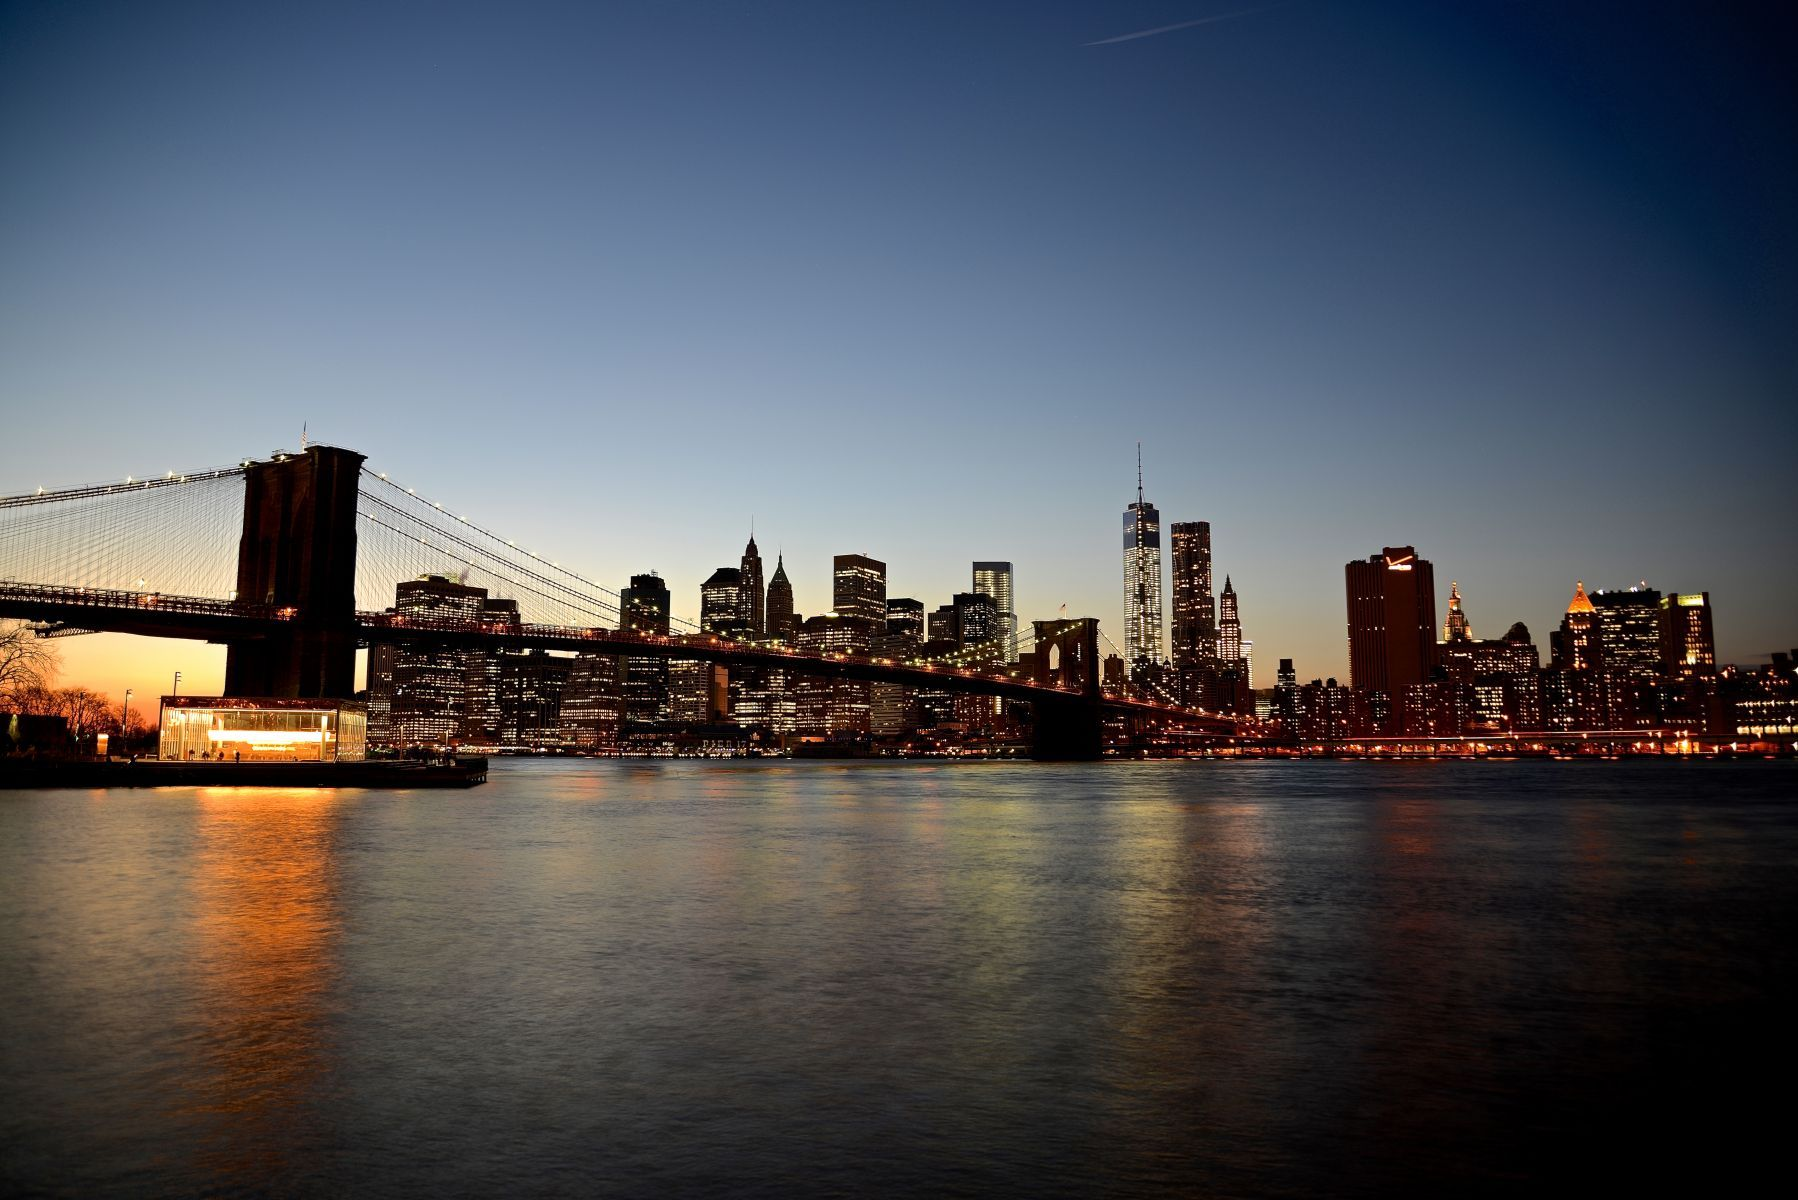 ''Brooklyn bridge''